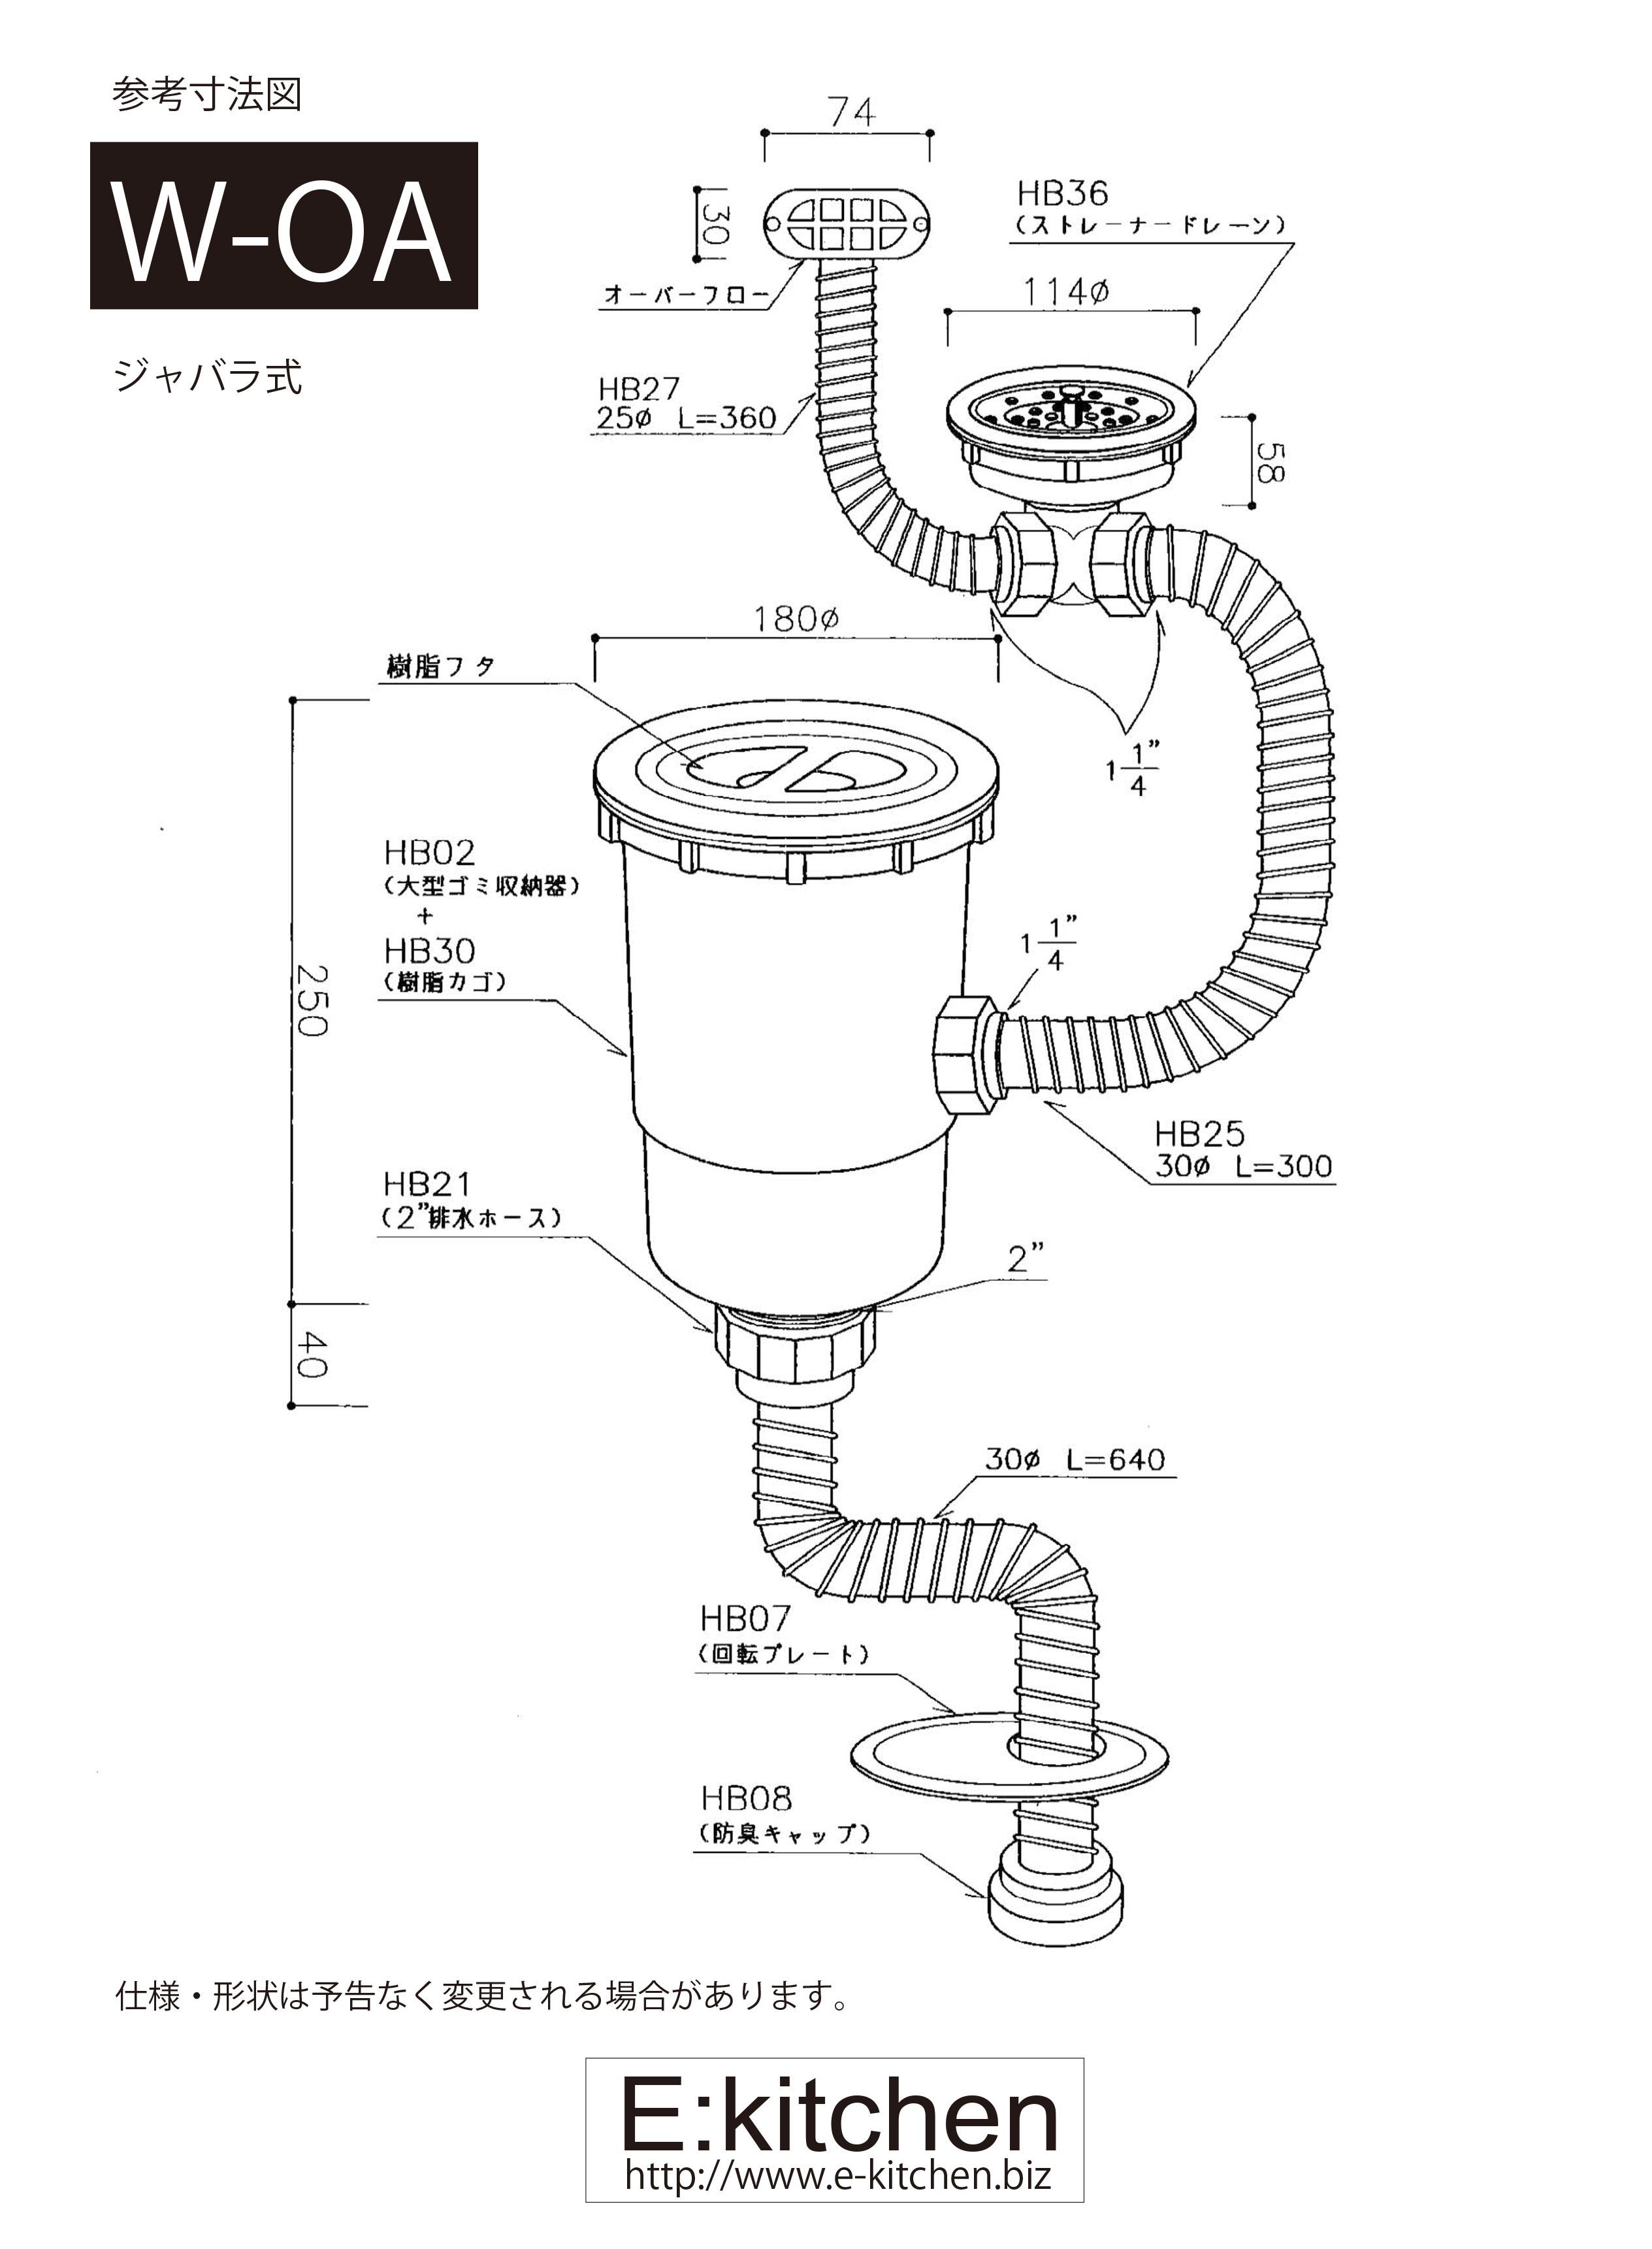 CKシリーズ 排水部品W-OA